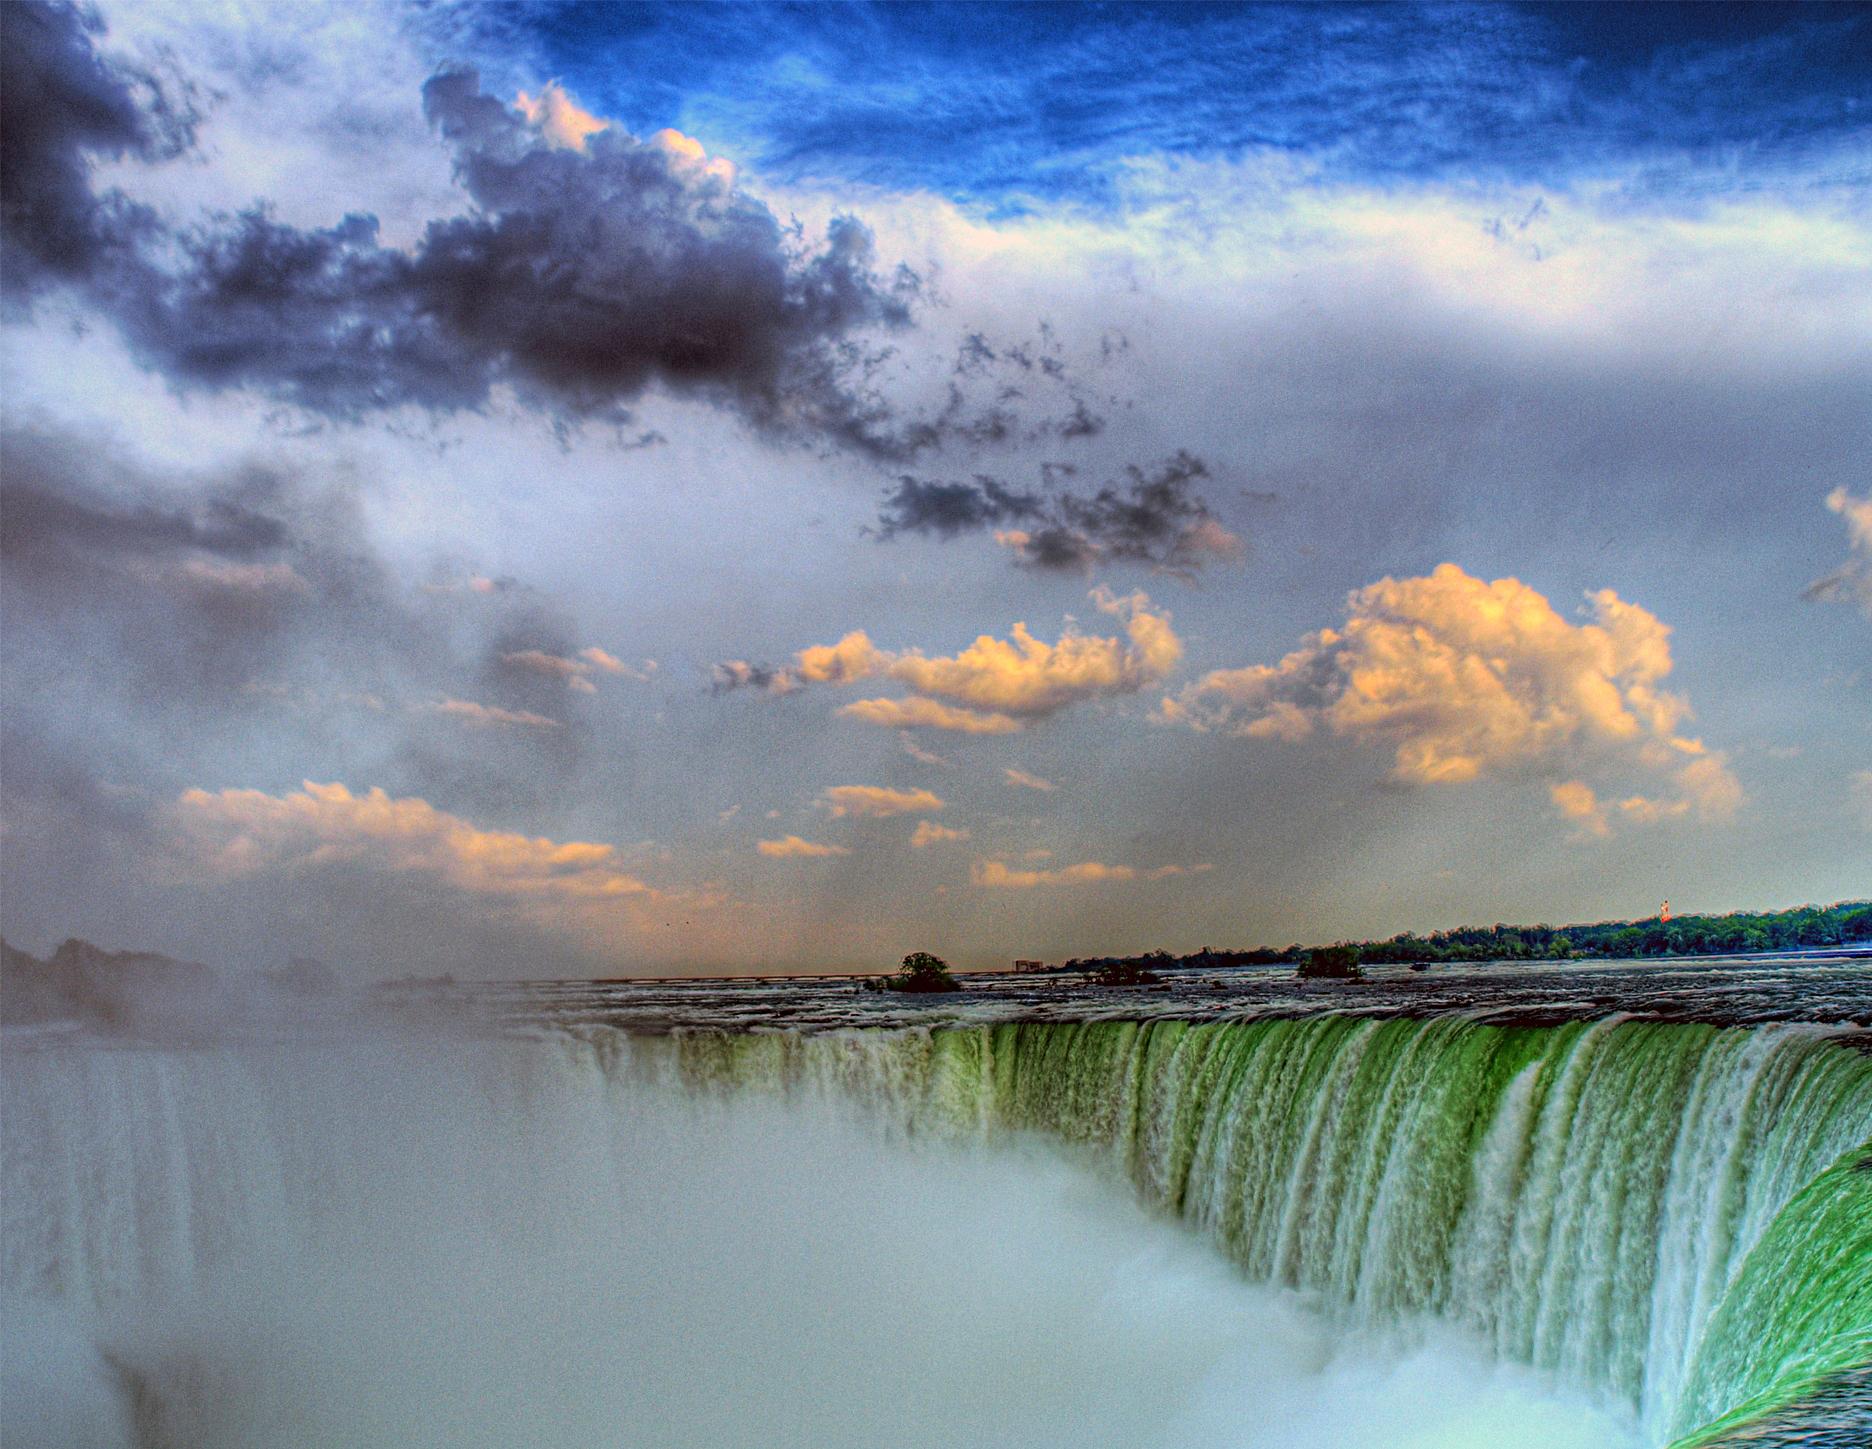 Photo by paul bica, Niagara Falls,  CC BY 2.0,    v ia Wikimedia Commons